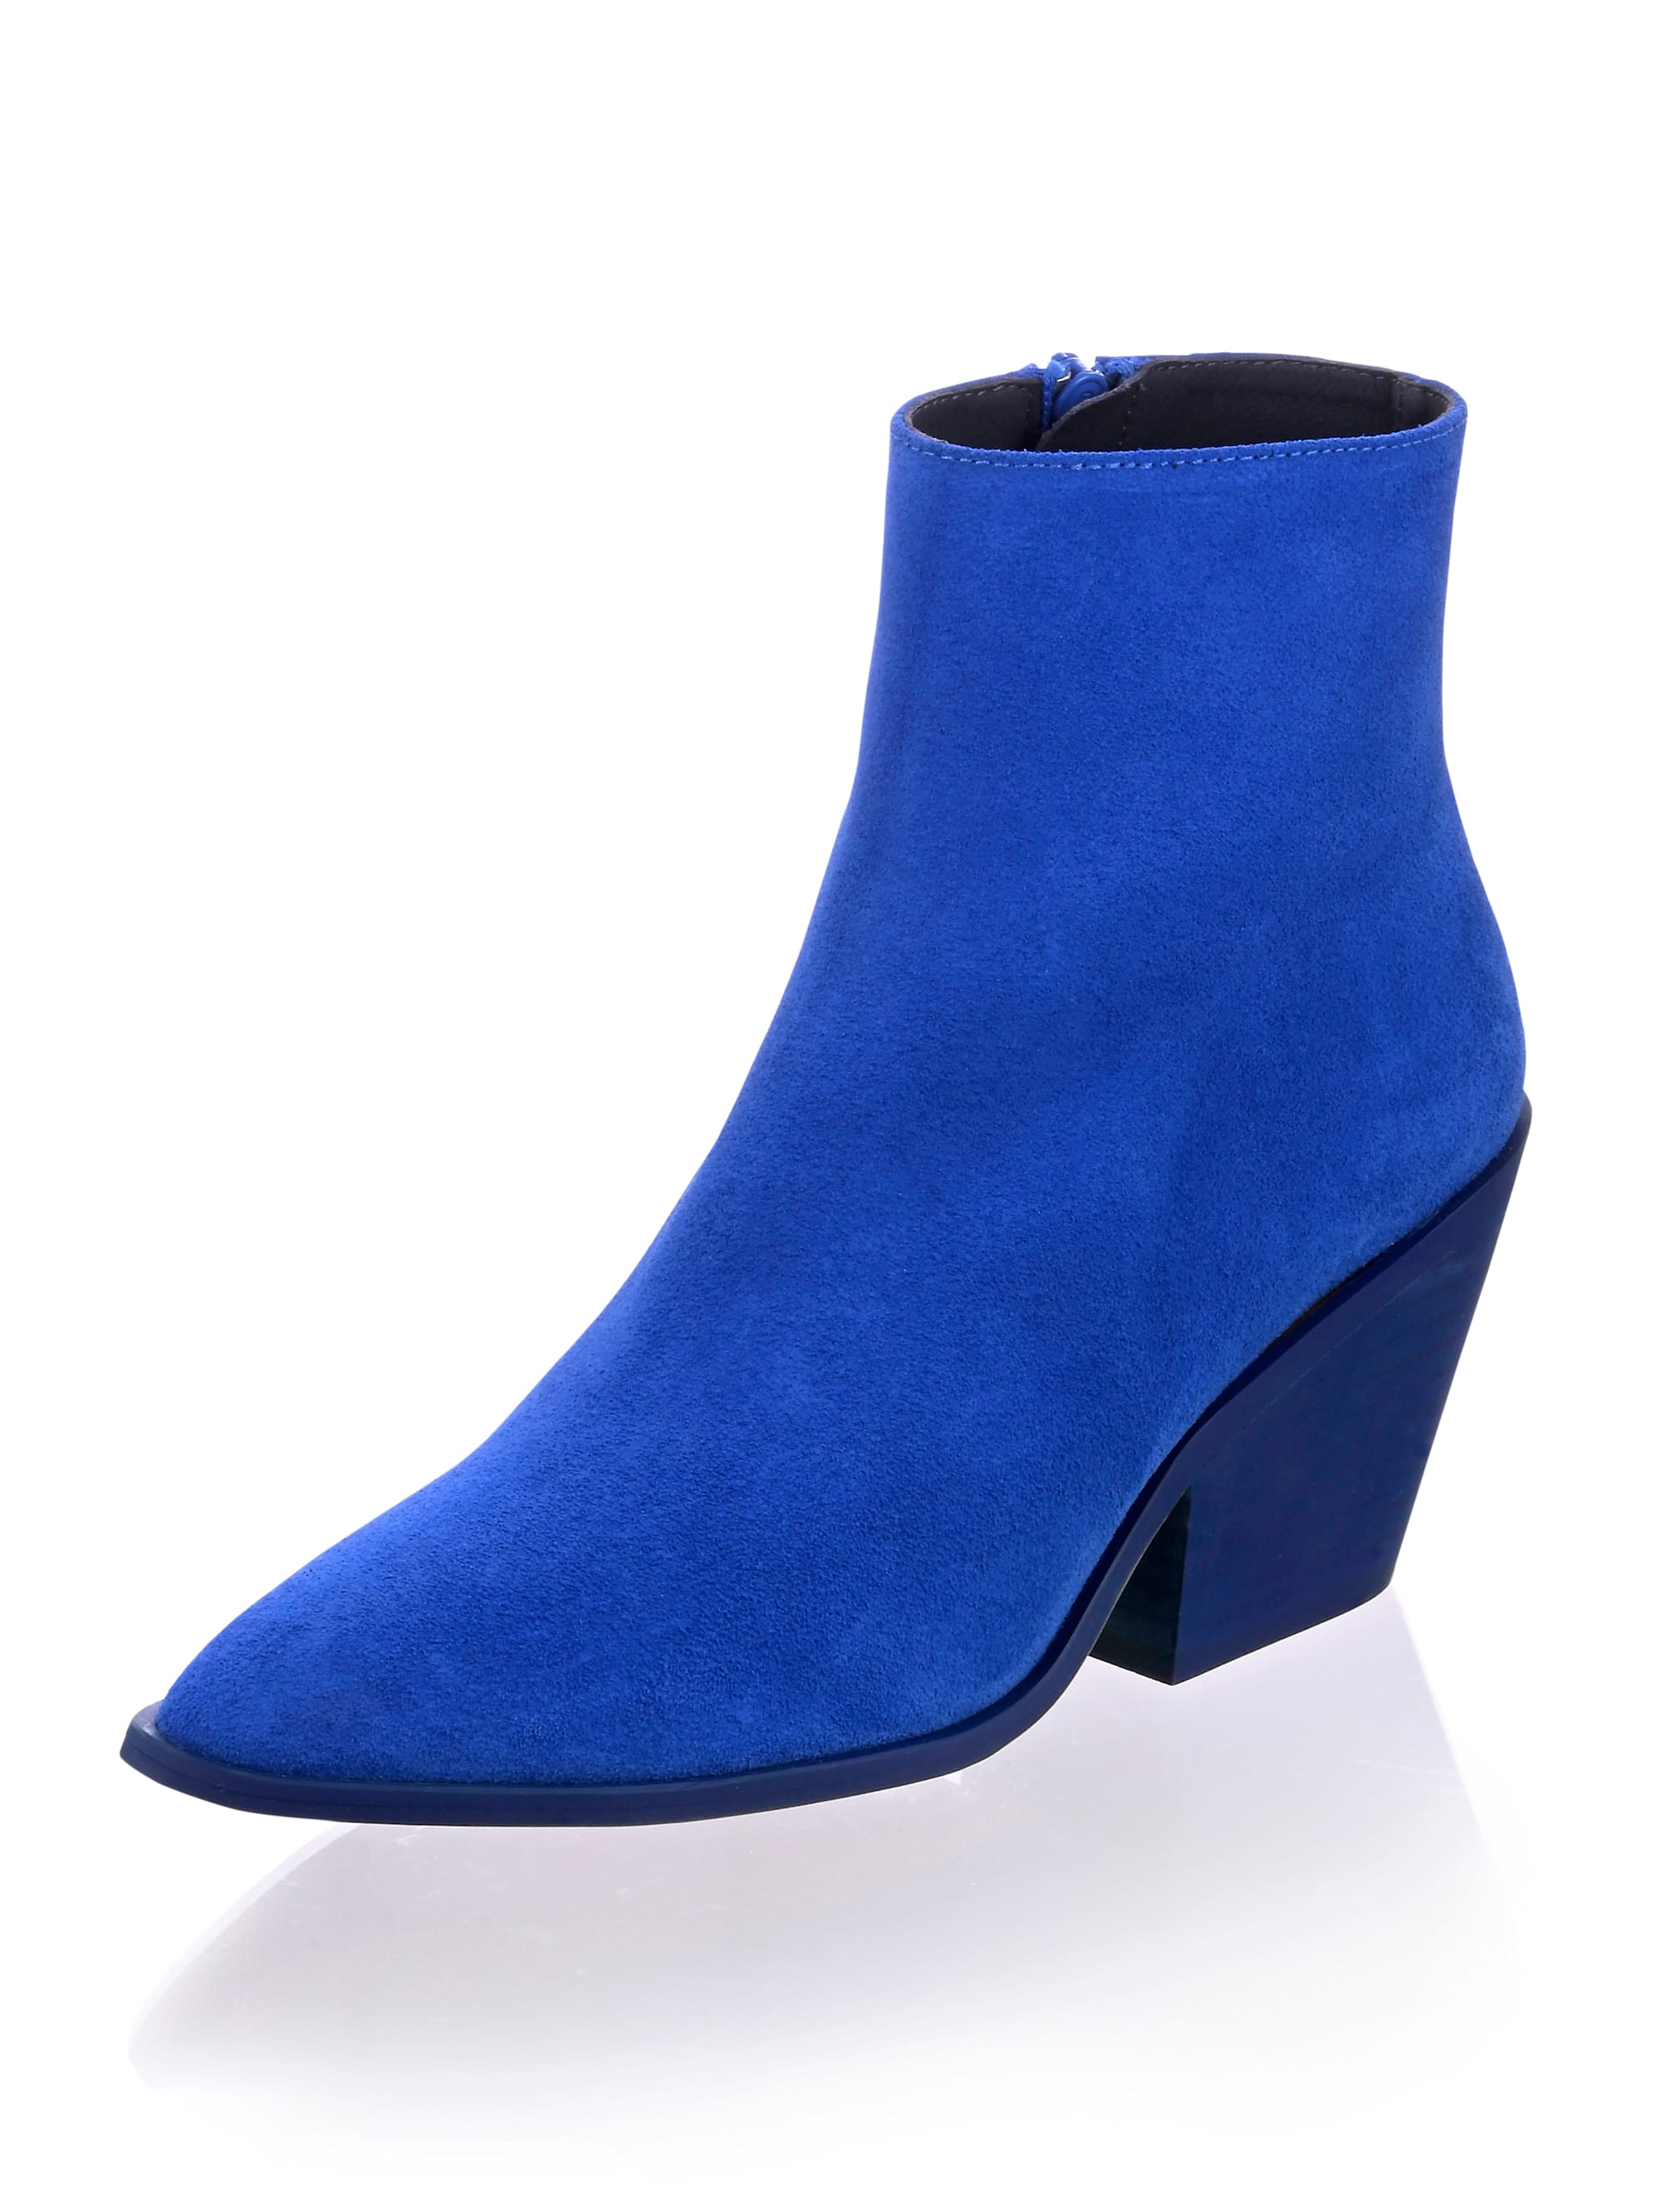 alba moda -  Stiefelette, in Cowboy-Form